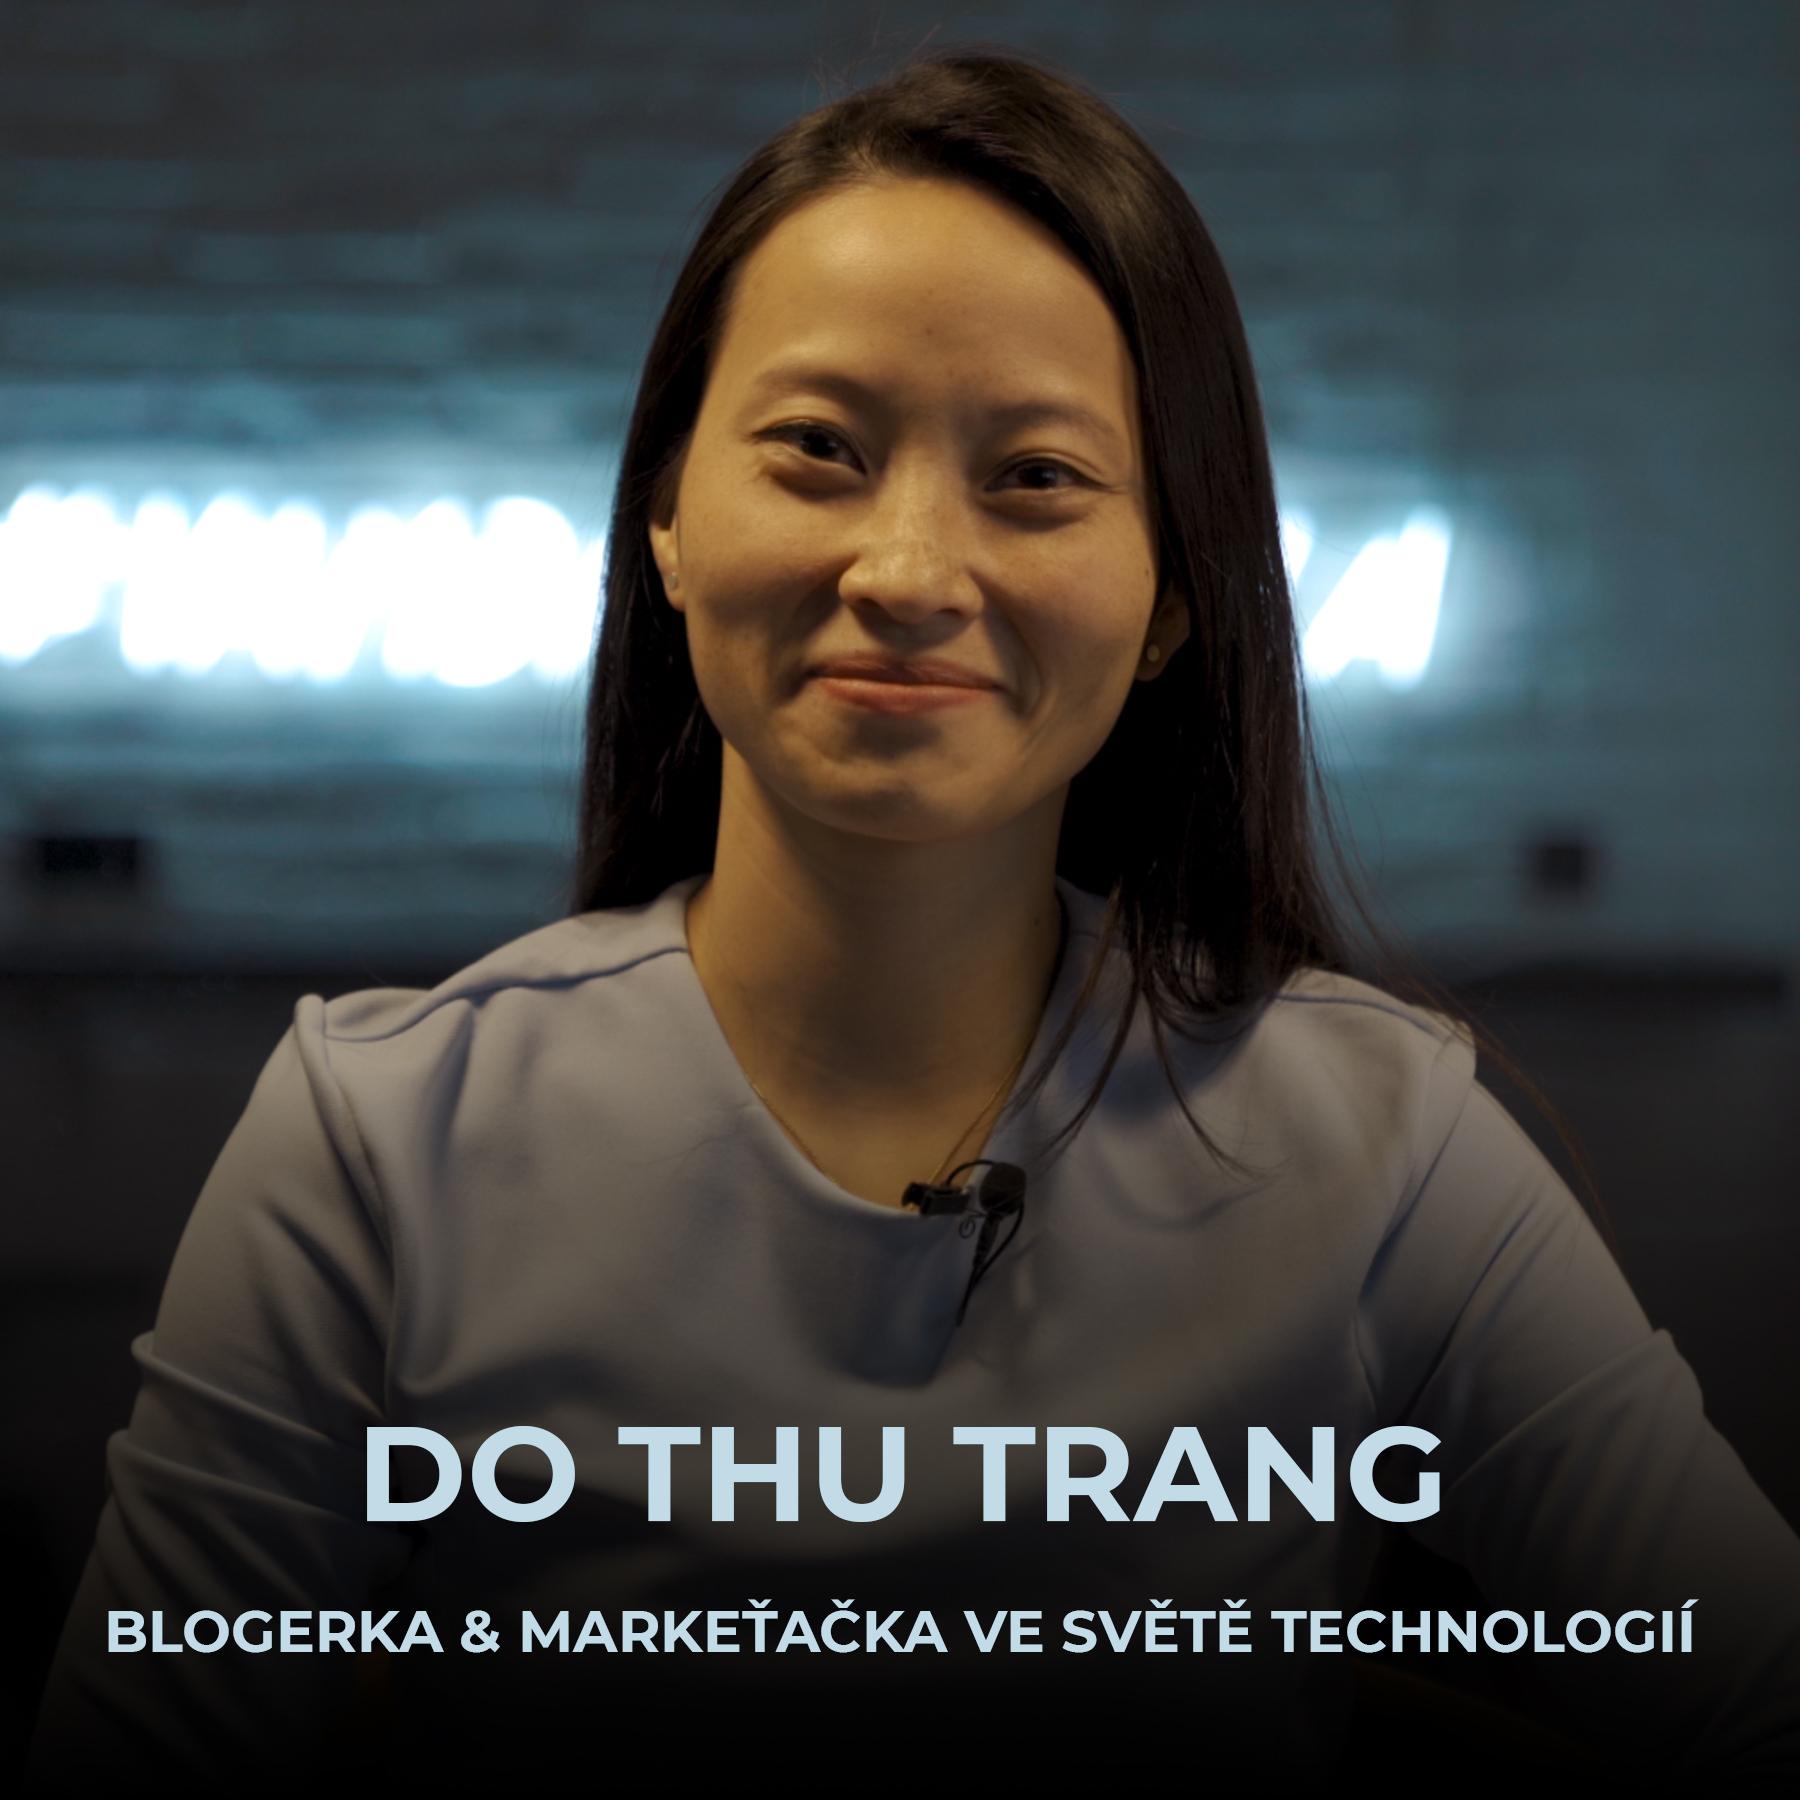 Trang-DoThu-IG-11